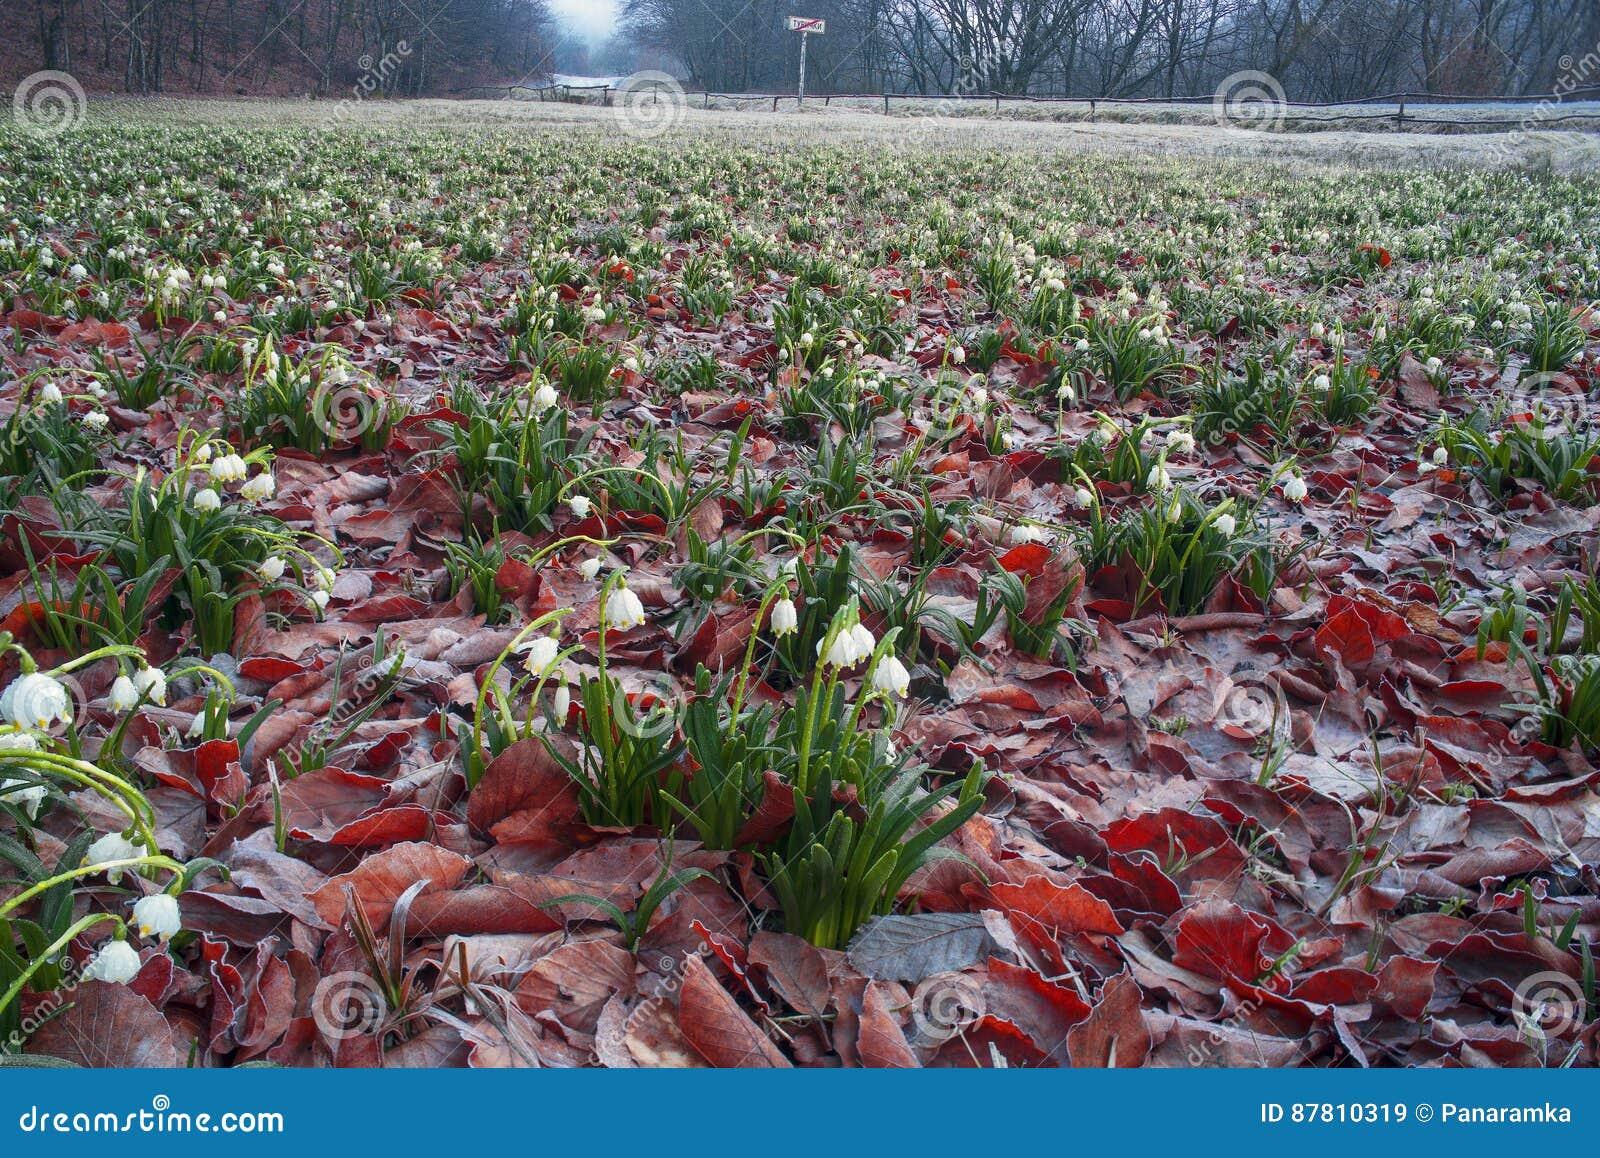 Spring Rare Flowers Stock Image Image Of Nature Beautiful 87810319